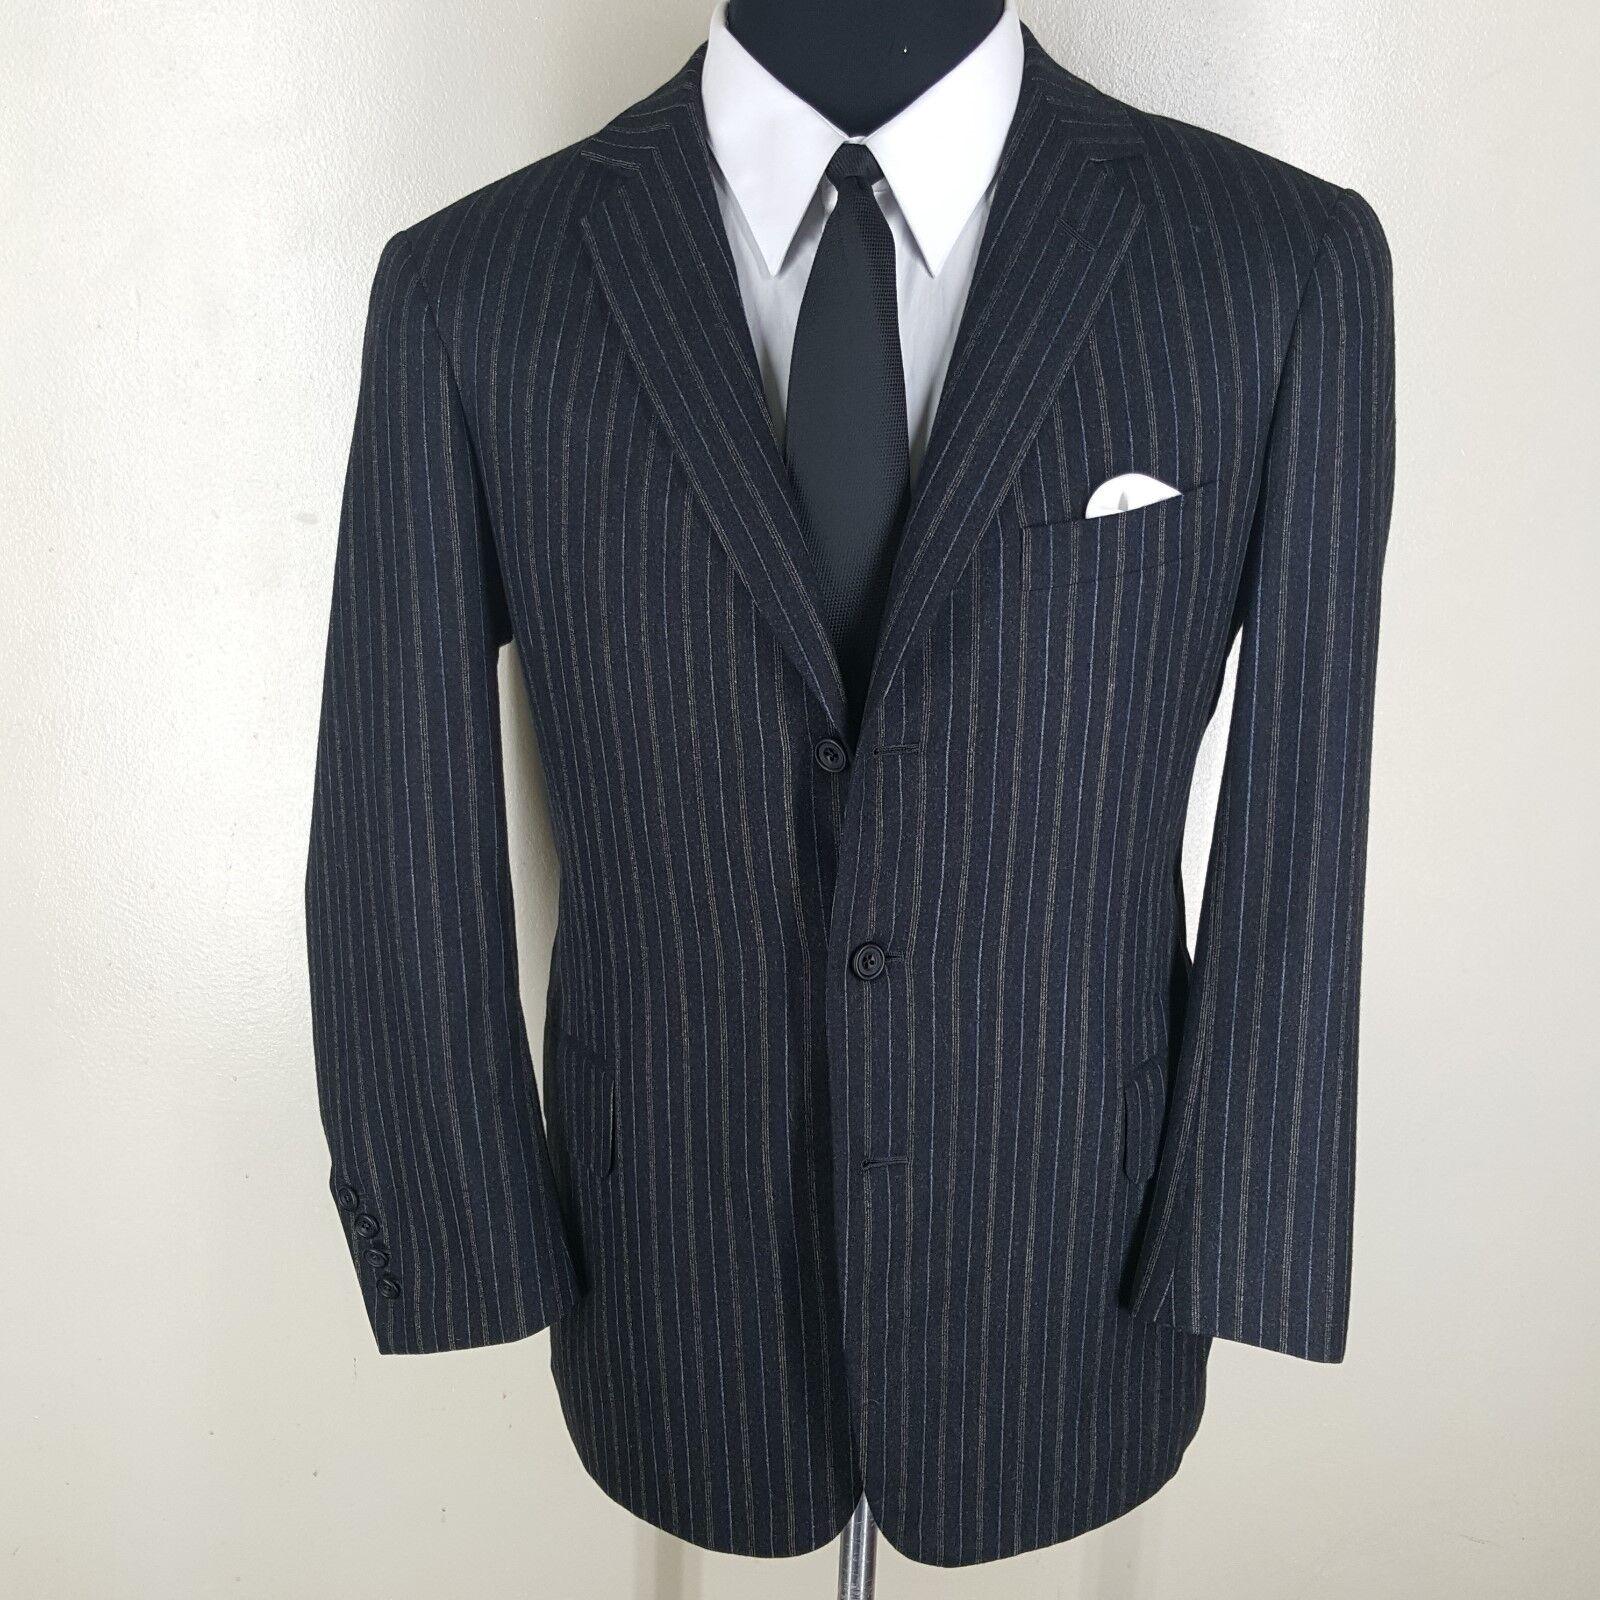 LEONARD LOGSDAIL Bespoke grau Sport Coat  3 Btn No Vents   Fit 42 Short